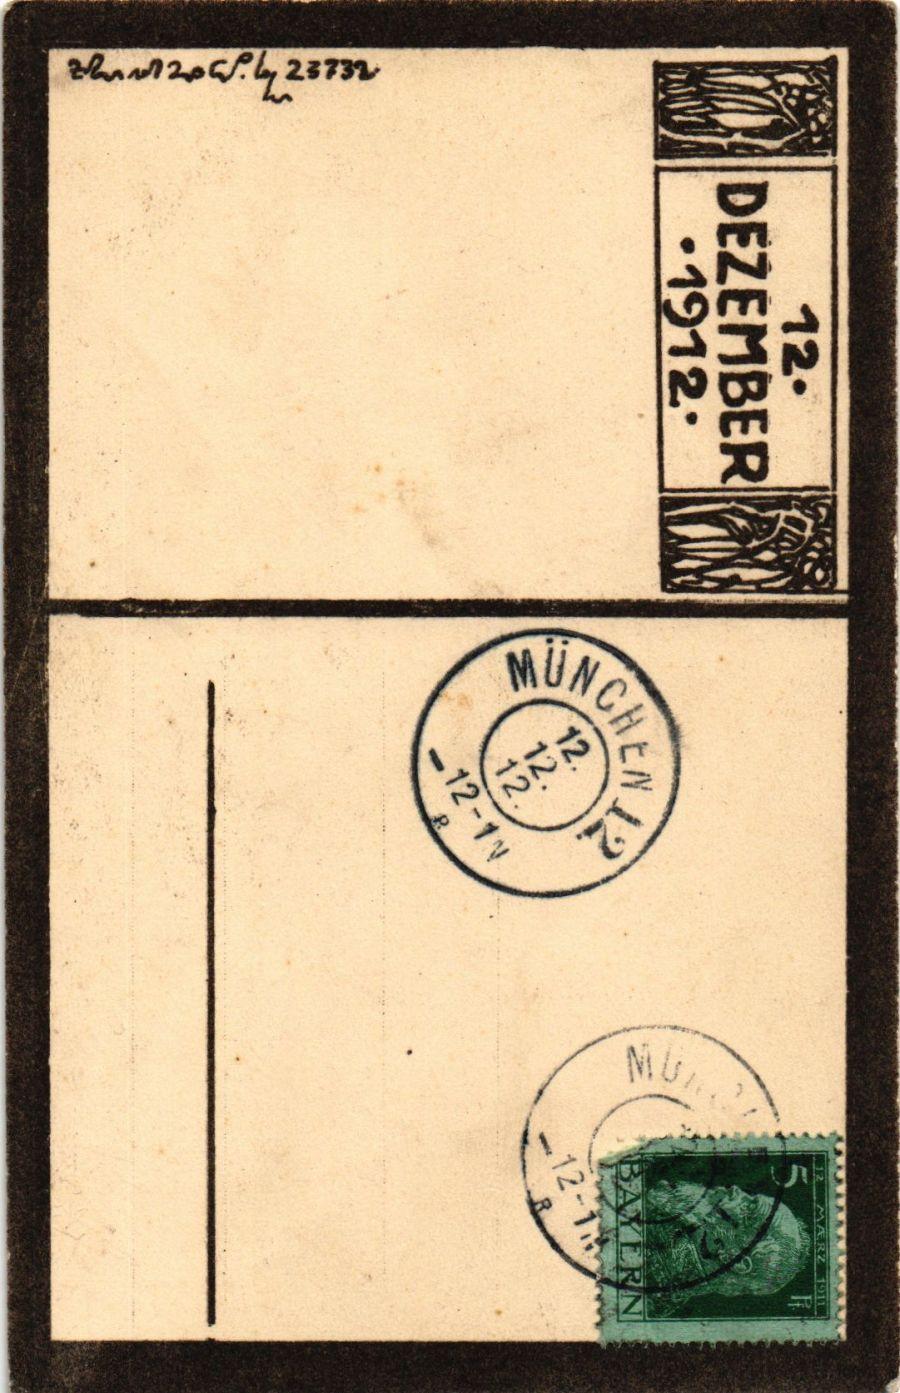 CPA-AK-Luitpold-v-Bayern-Prinz-Regent-GERMAN-ROYALTY-867328 Indexbild 2